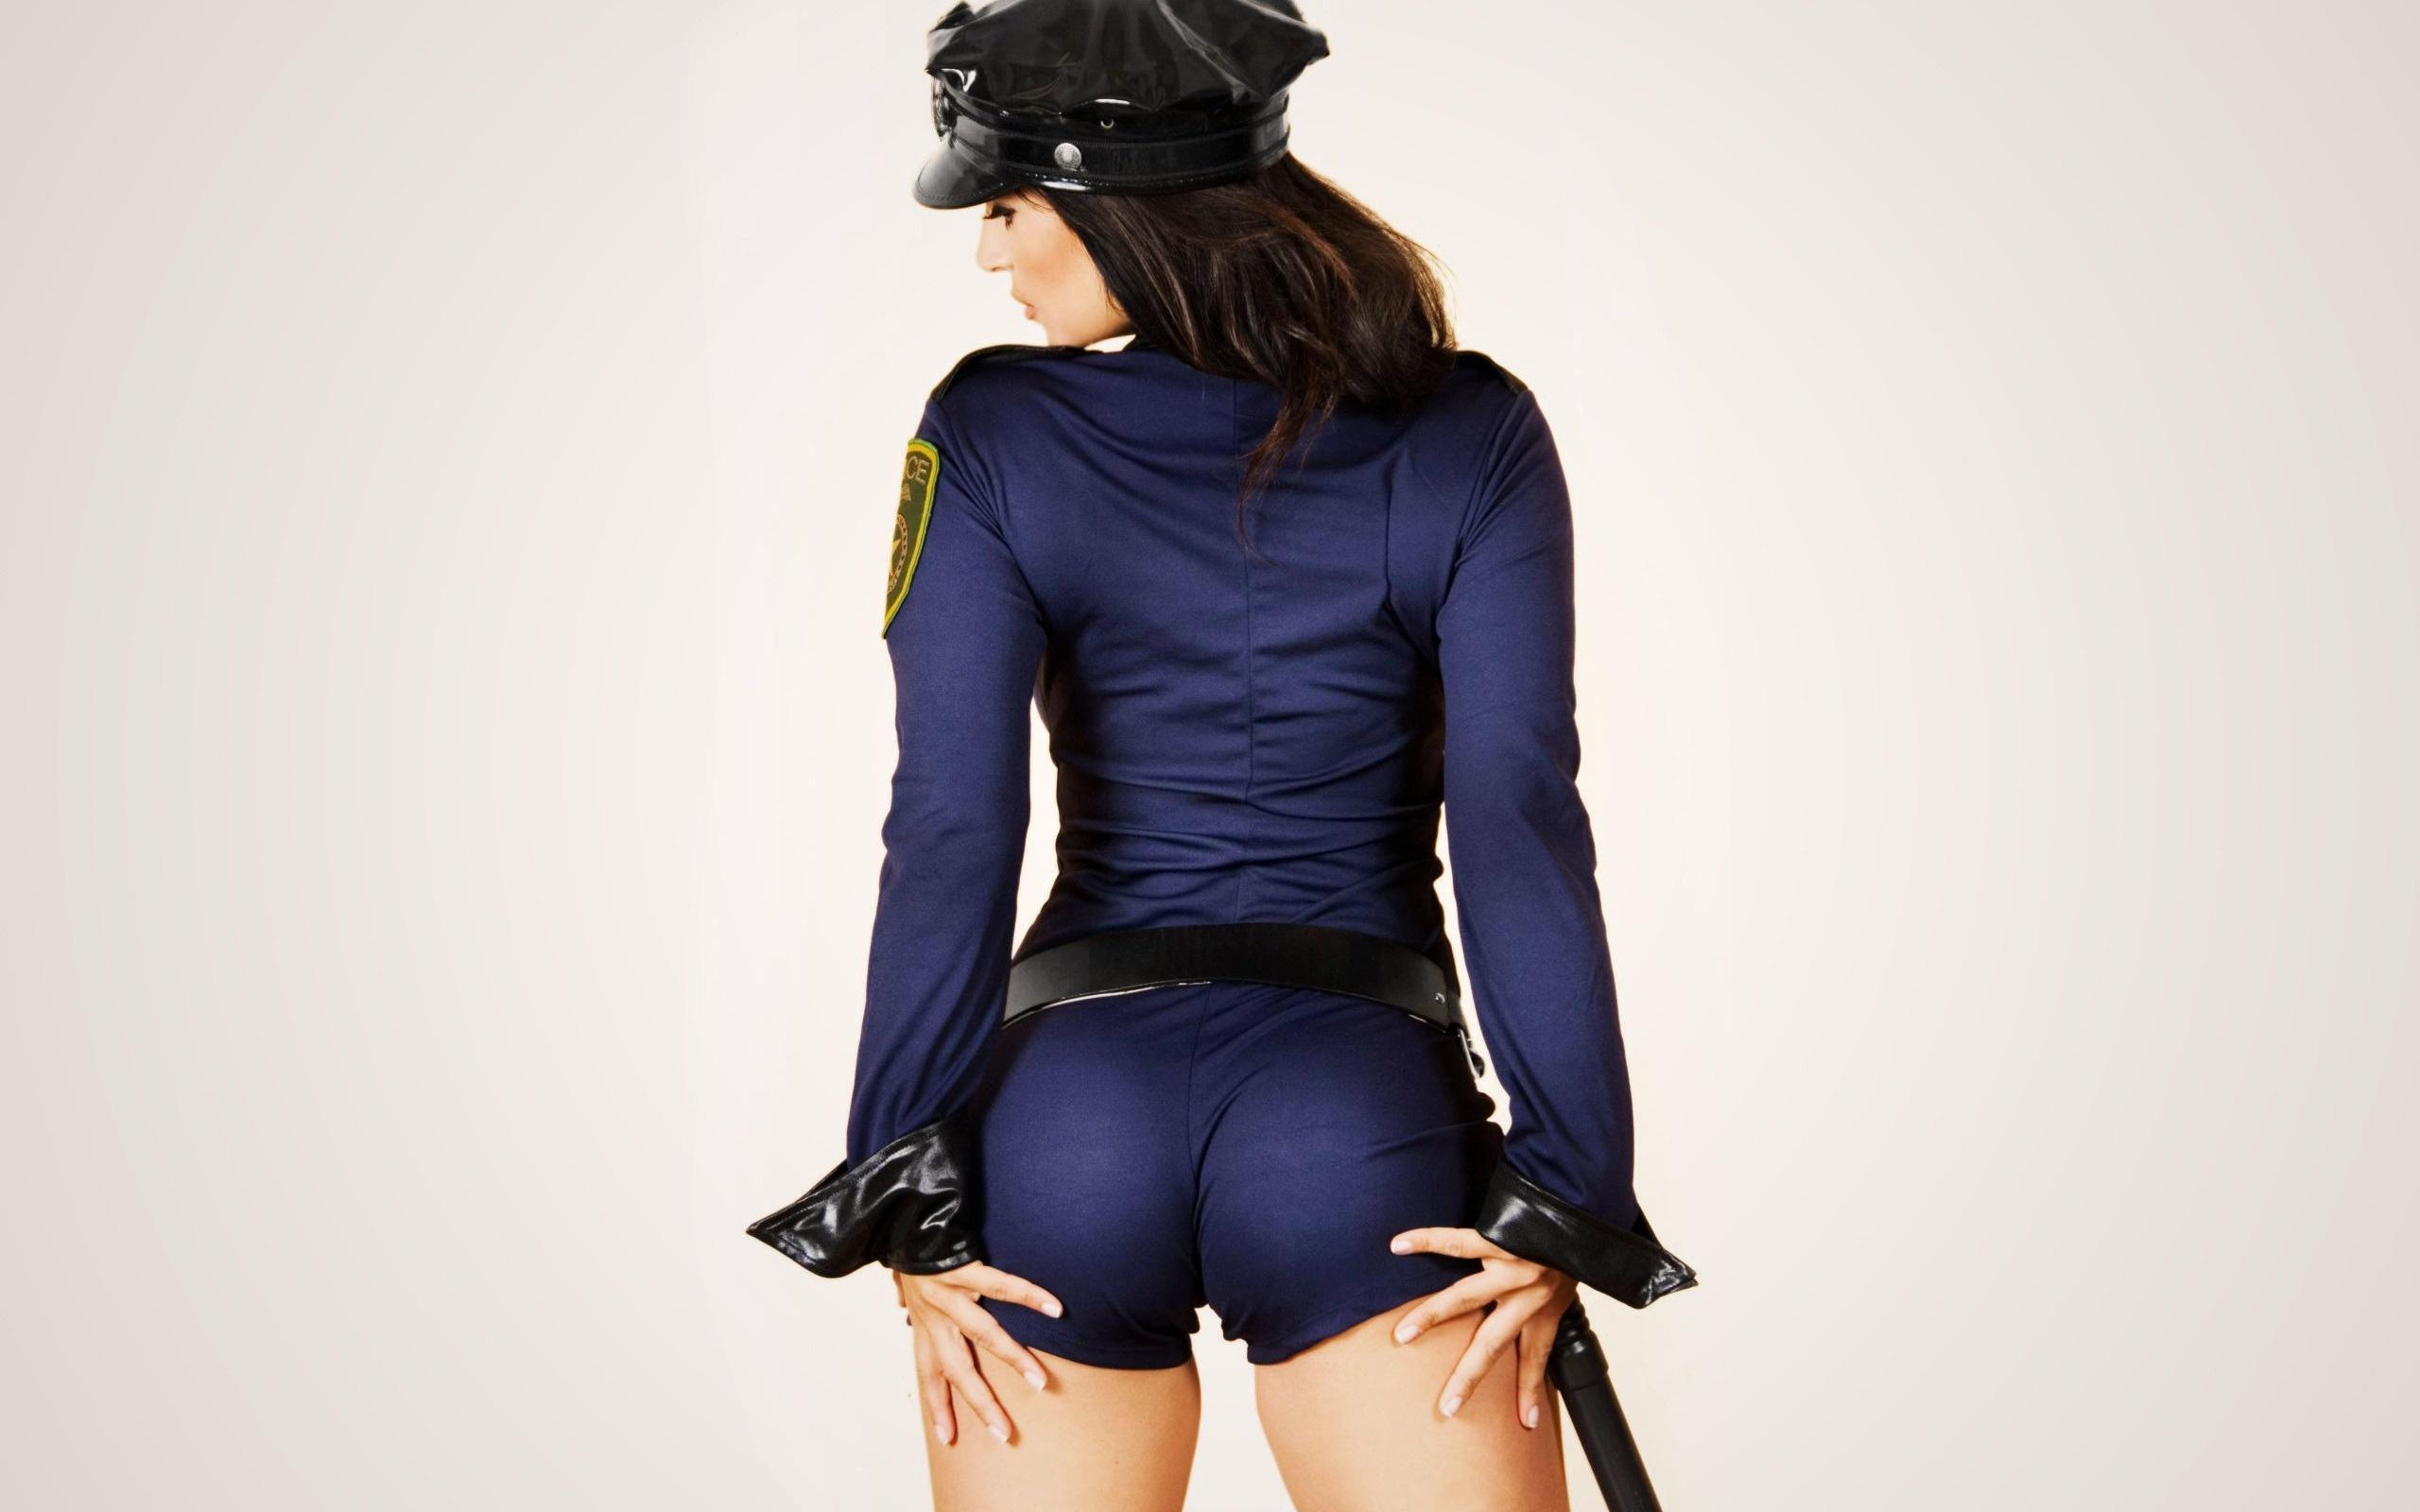 Denise milani blue lingerie video clase vergota